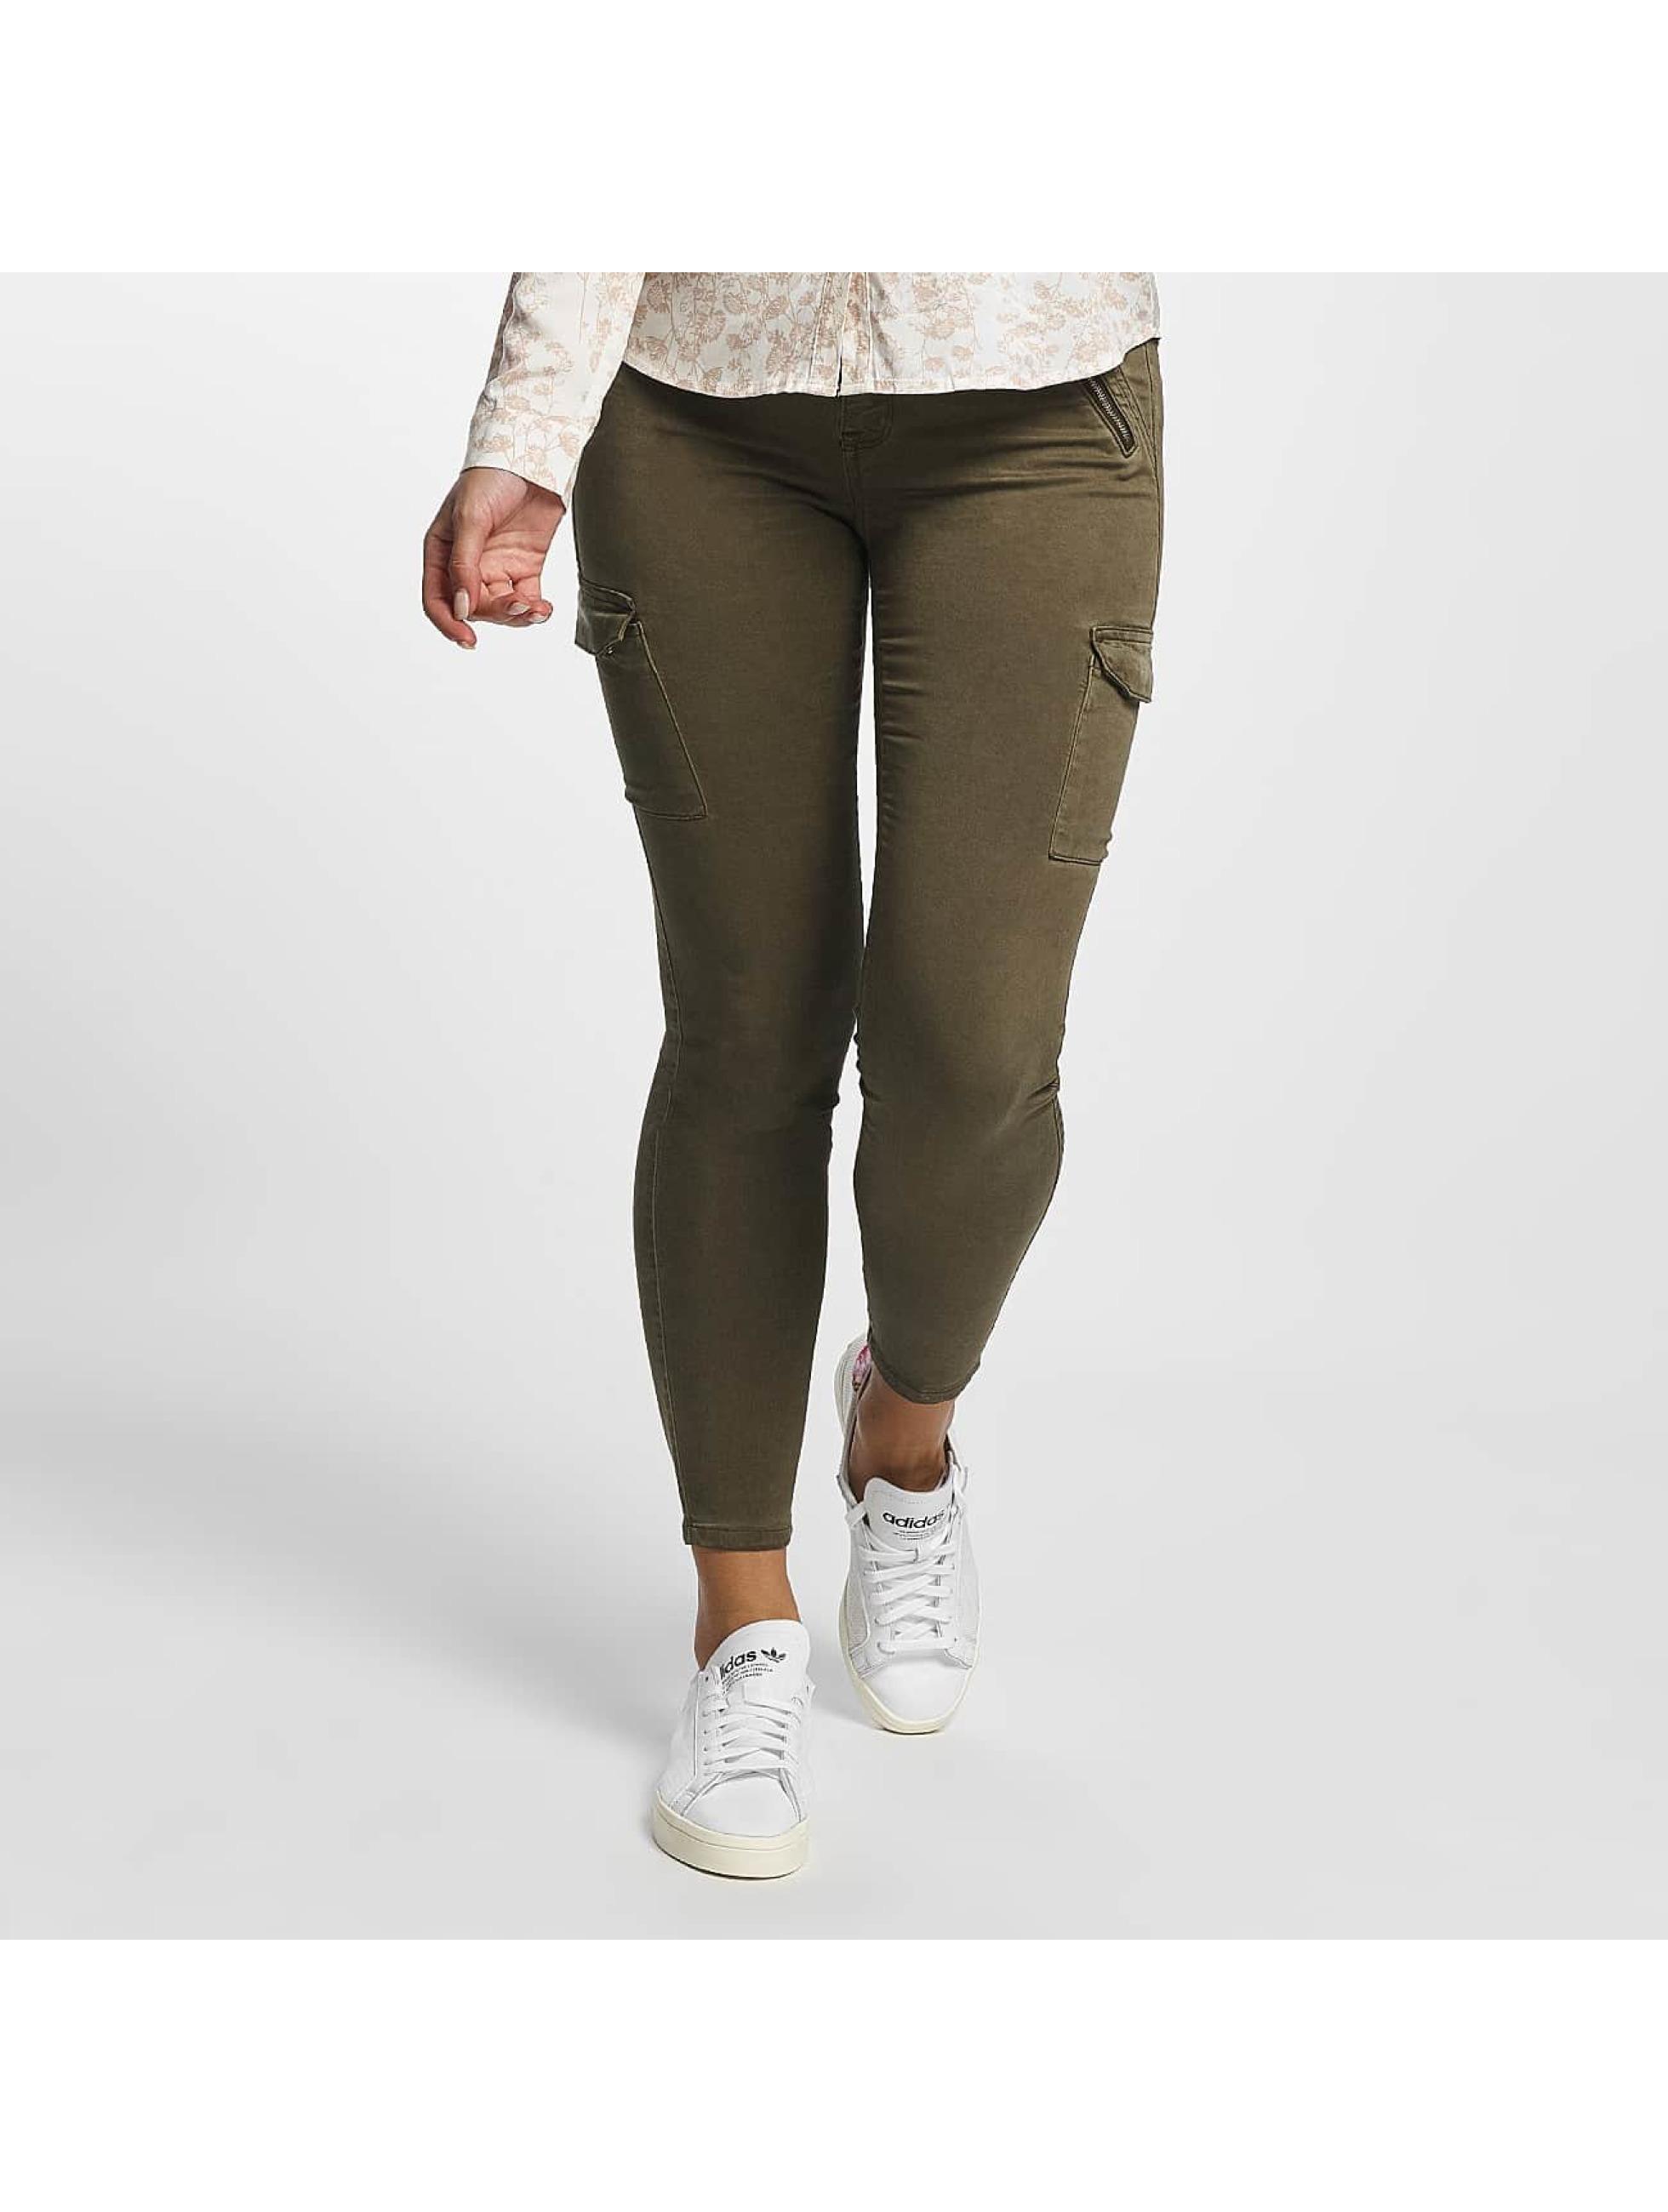 Mavi Jeans Frauen Cargohose Adriana Ankle in olive